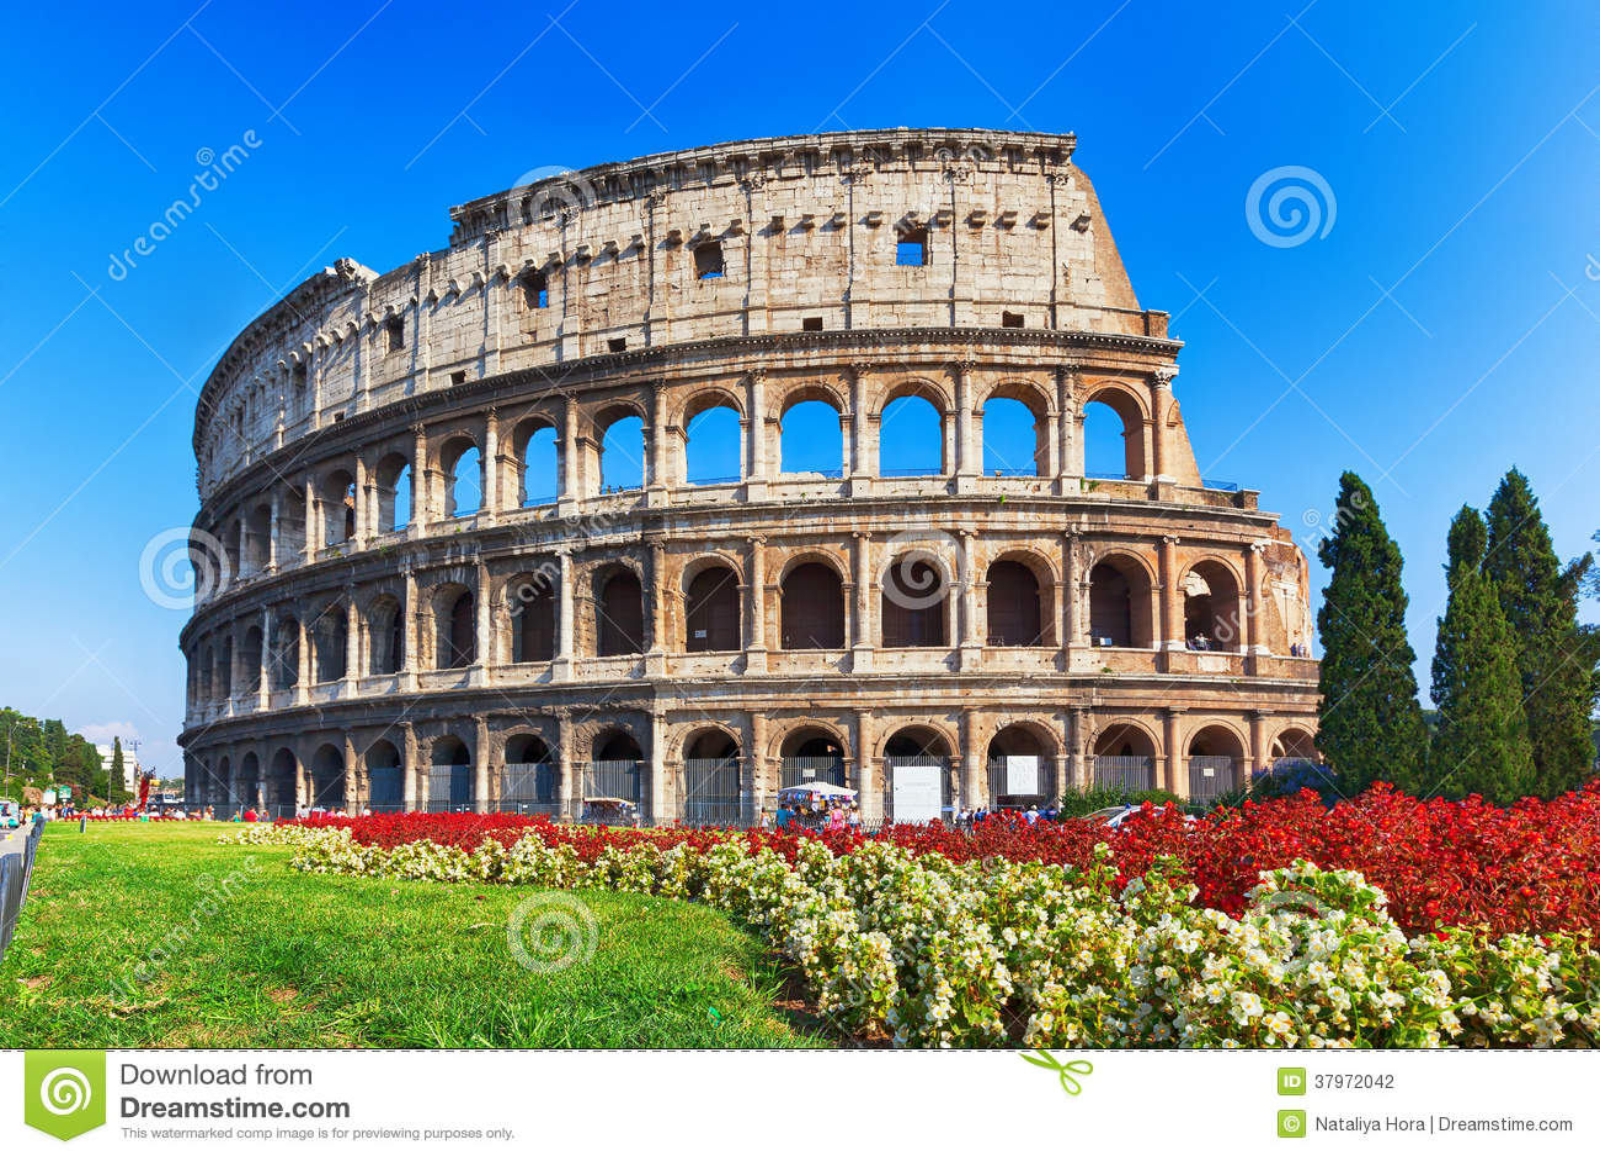 Colosseum antiguo en Roma, Italia